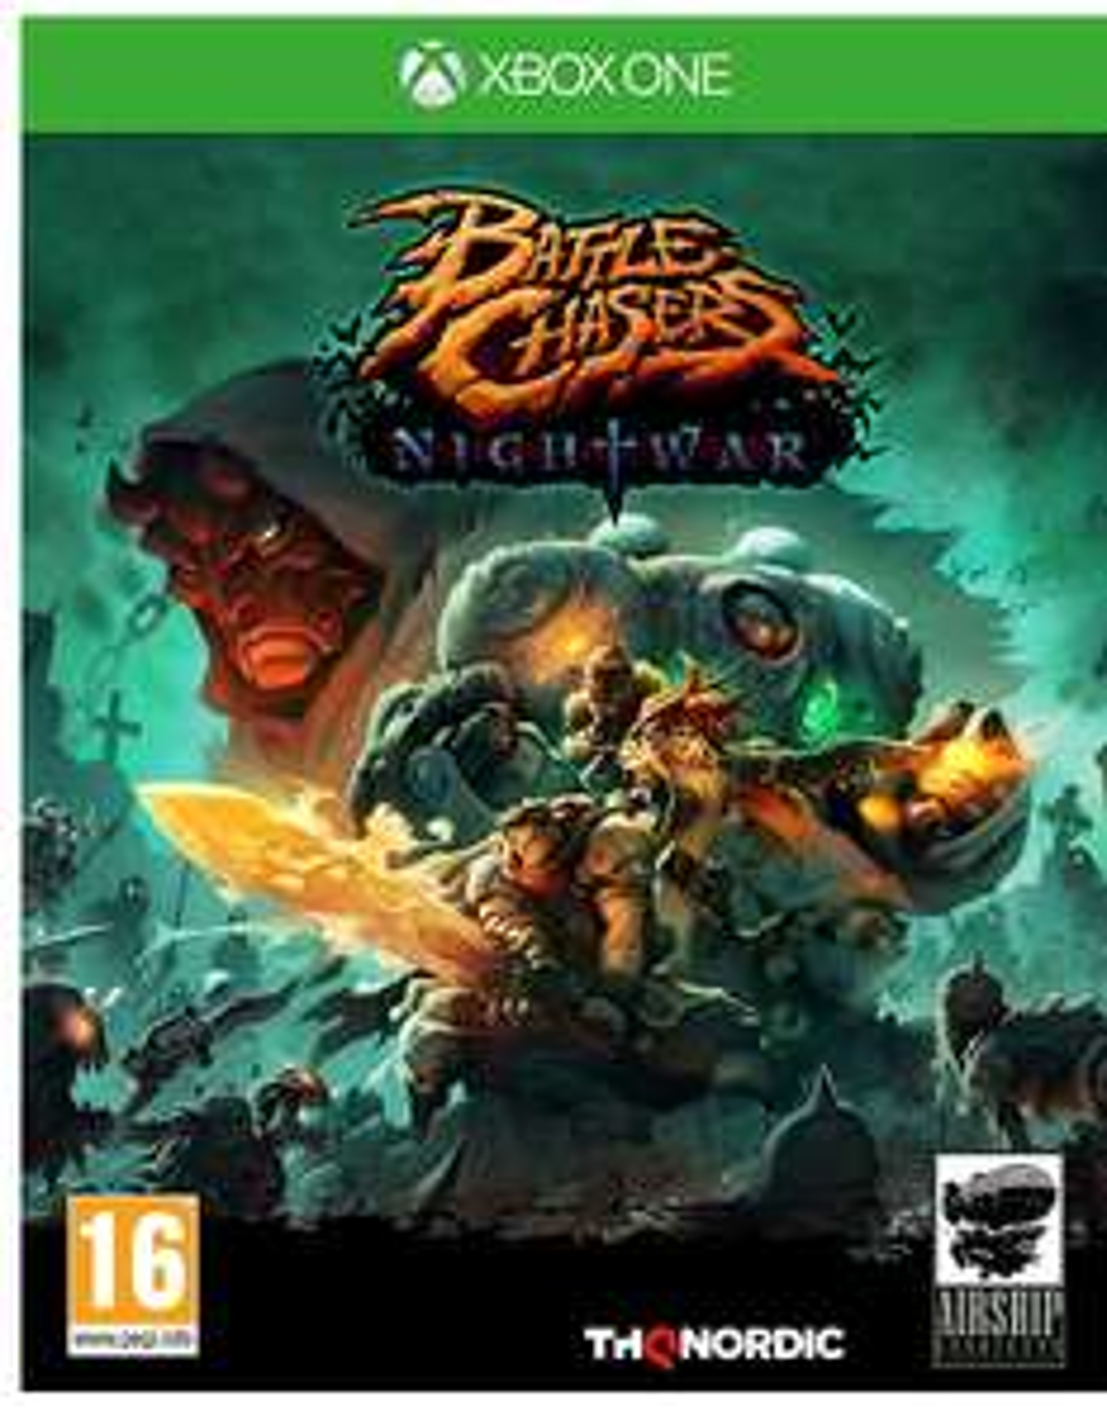 Battle Chasers: Nightwar XB1 & PS4 £12.50 lightning deal (£14.49 non prime)